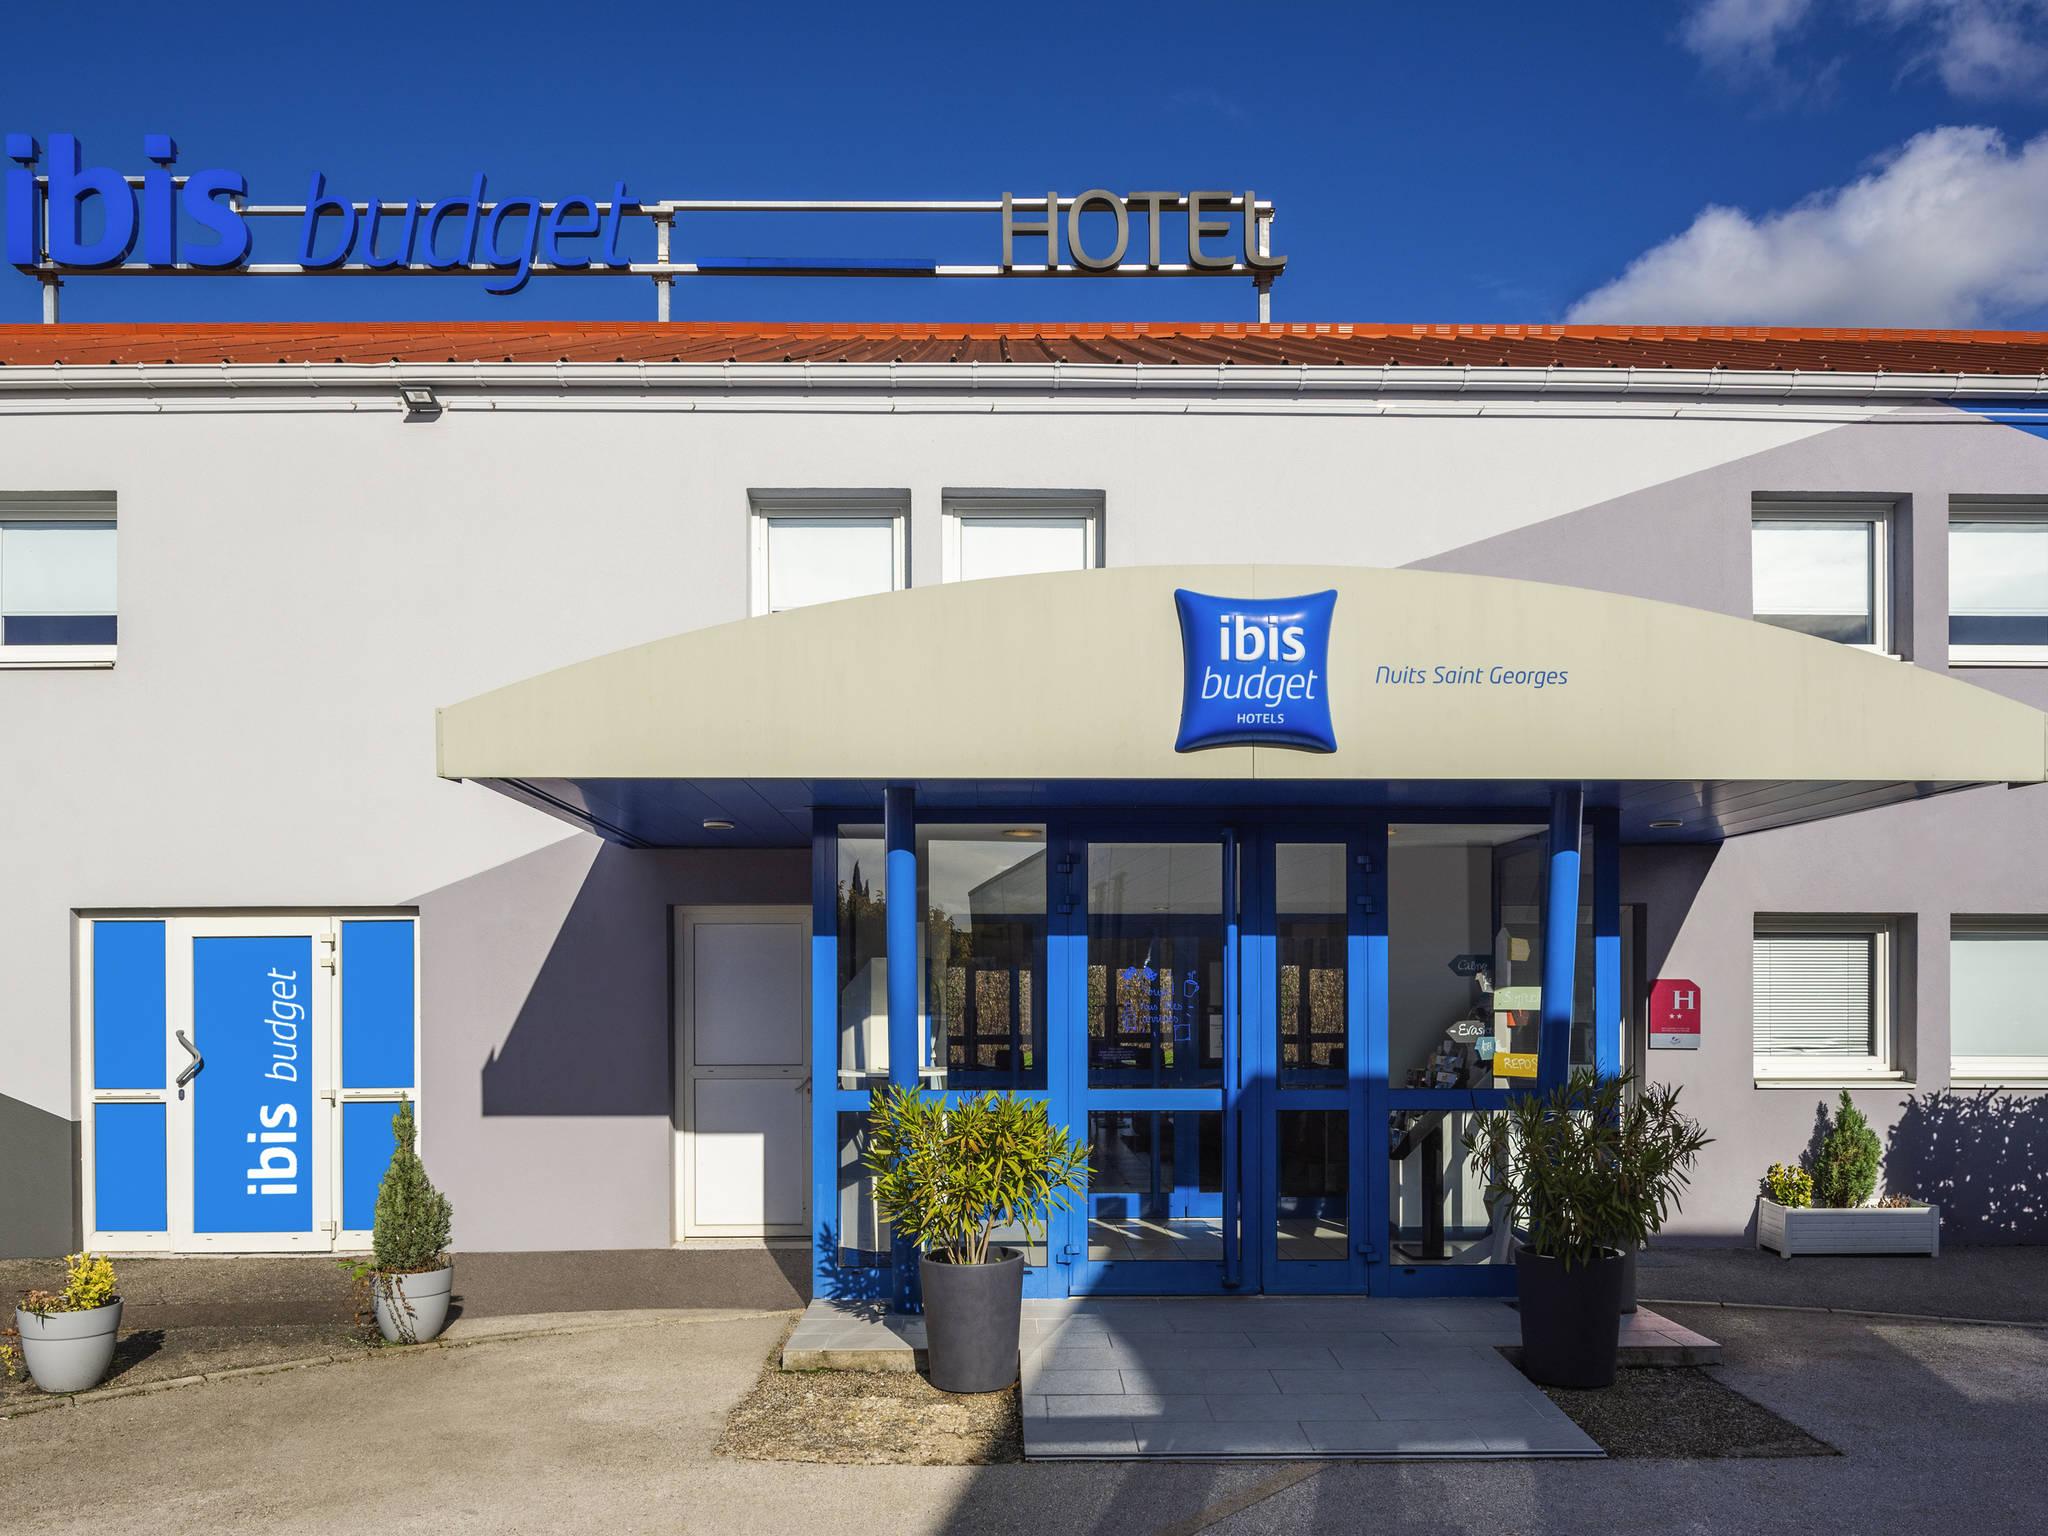 Hotel - ibis budget Nuits Saint Georges